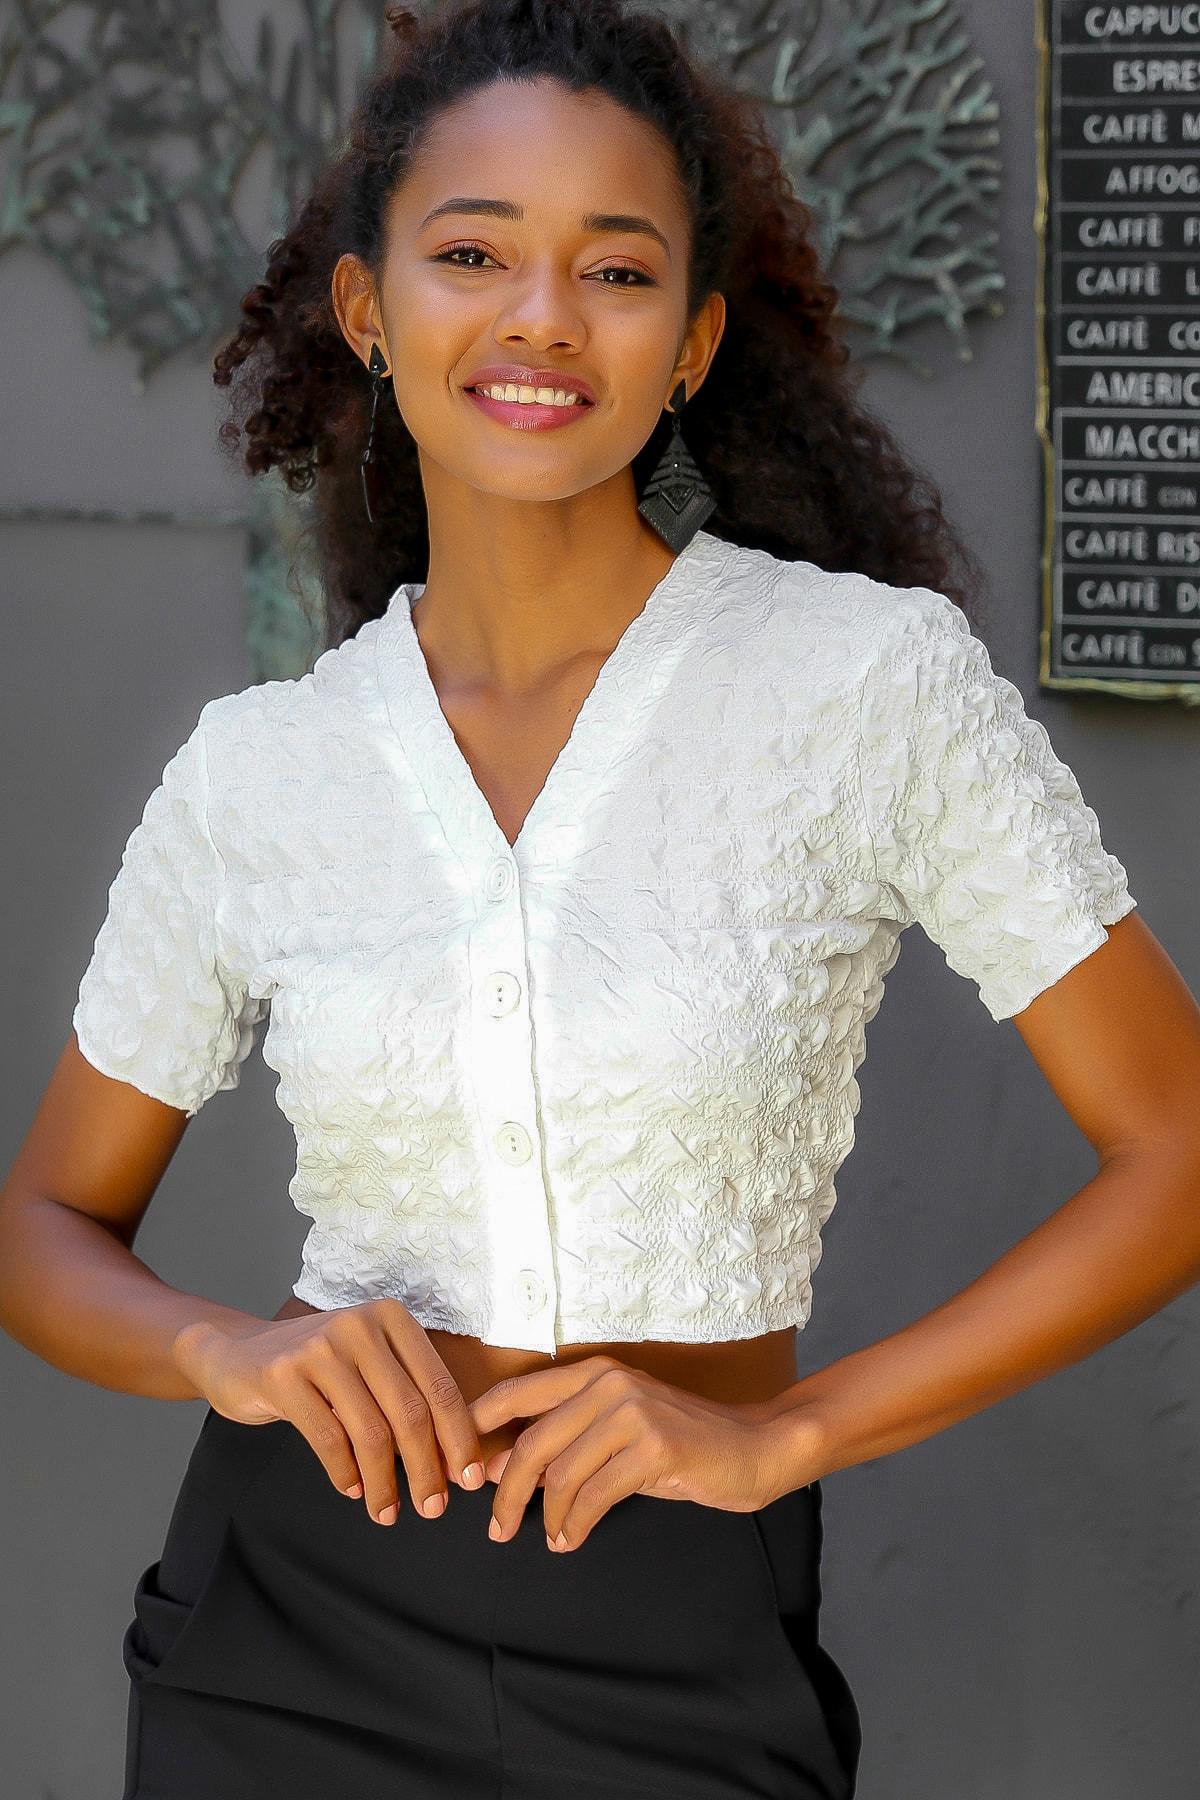 Chiccy Kadın Beyaz V Yaka Düğmeli Dokuma Crop Bluz M10010200BL95104